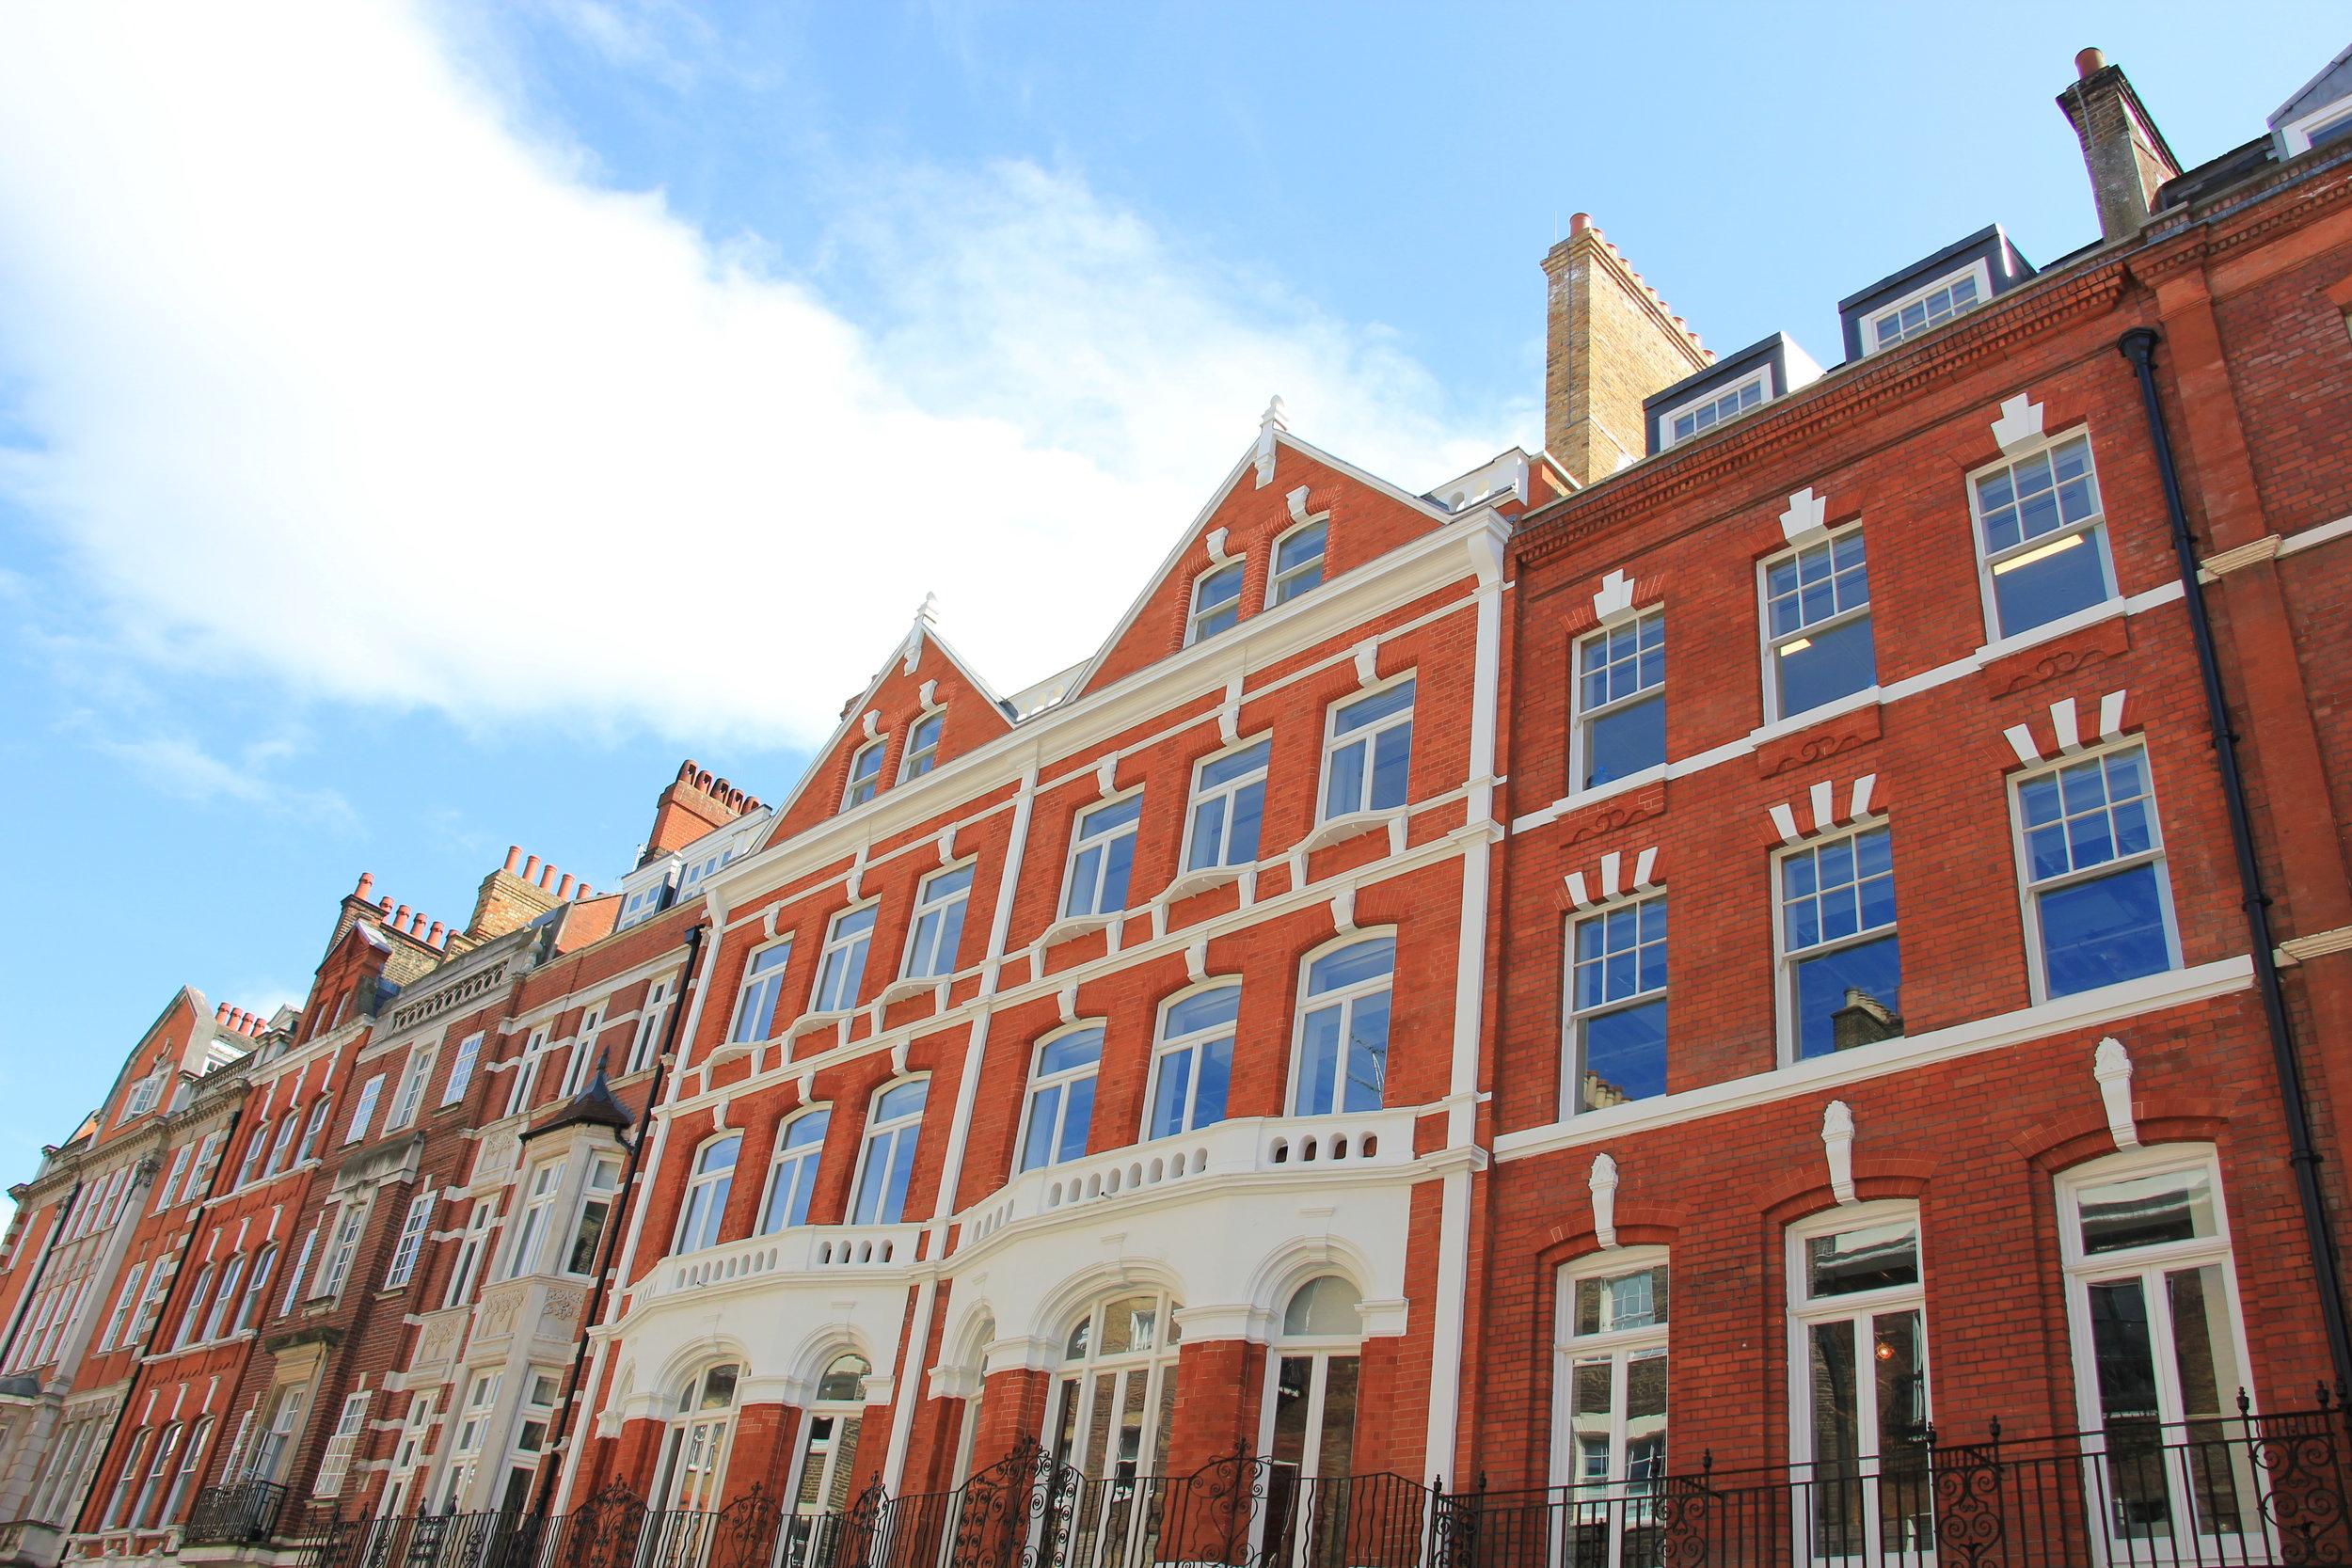 47-53 Queen Anne Street, London